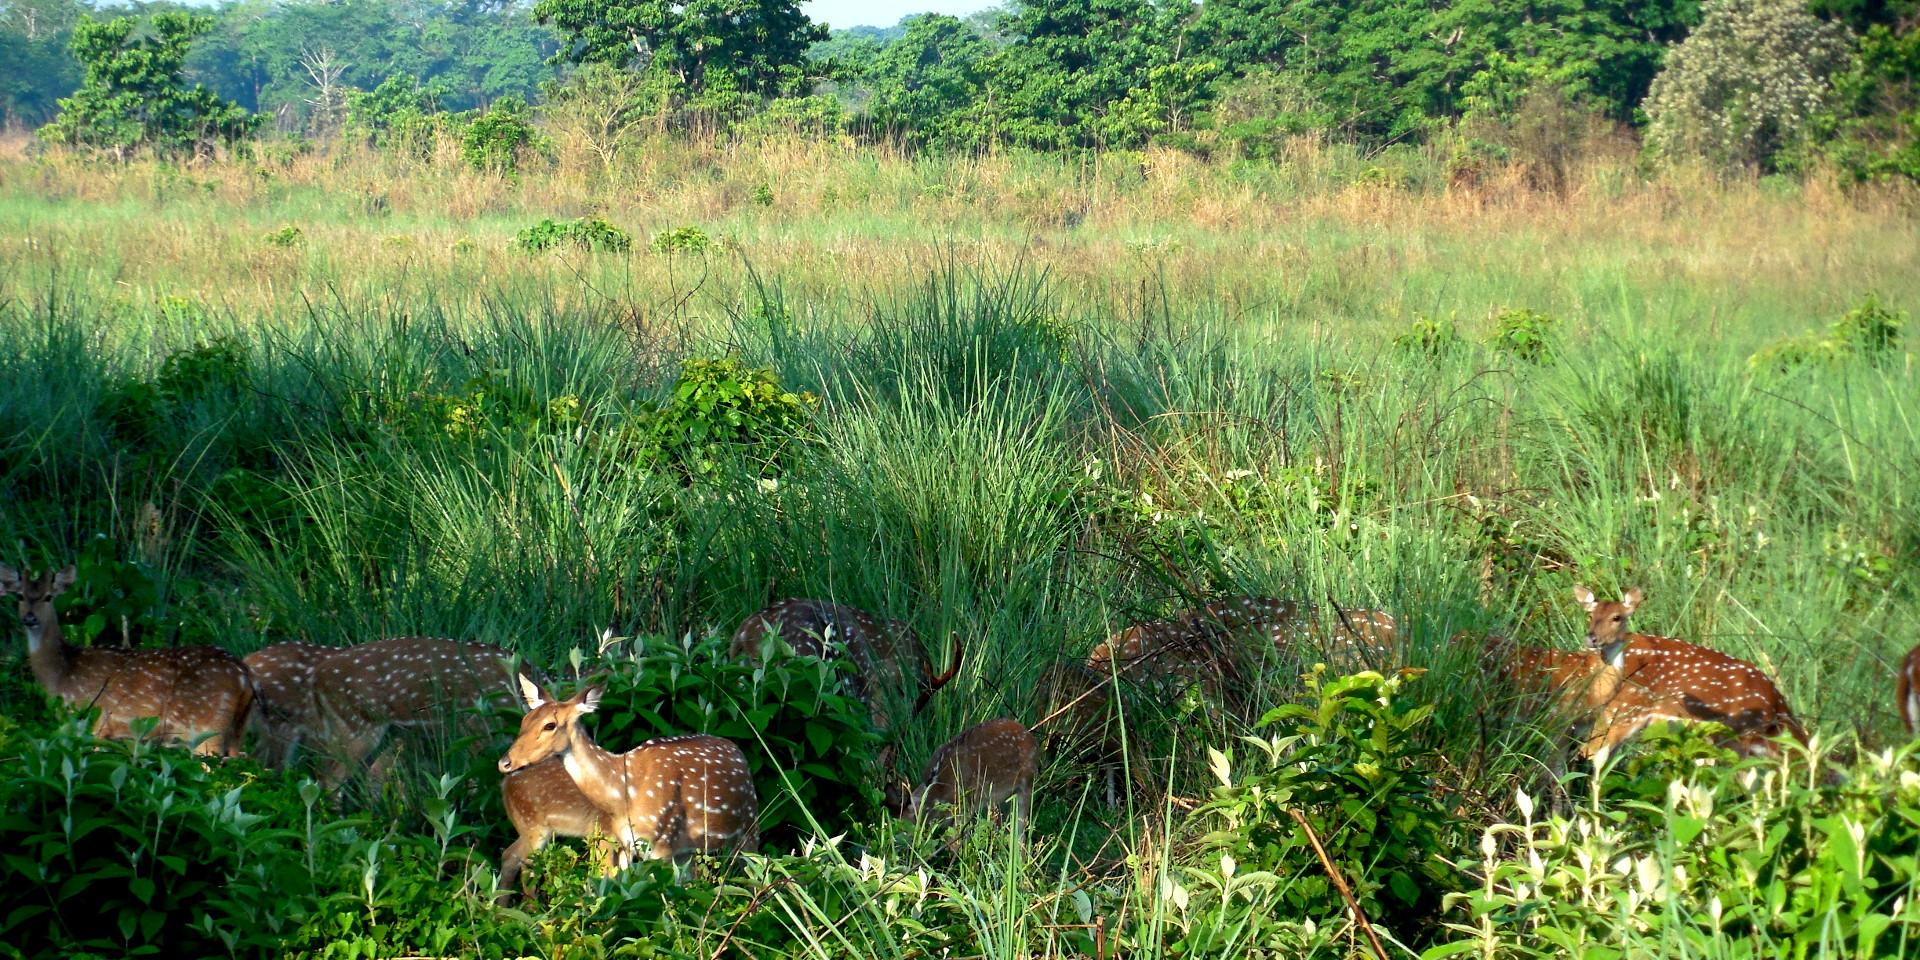 Herd of Chital (spotted deer).